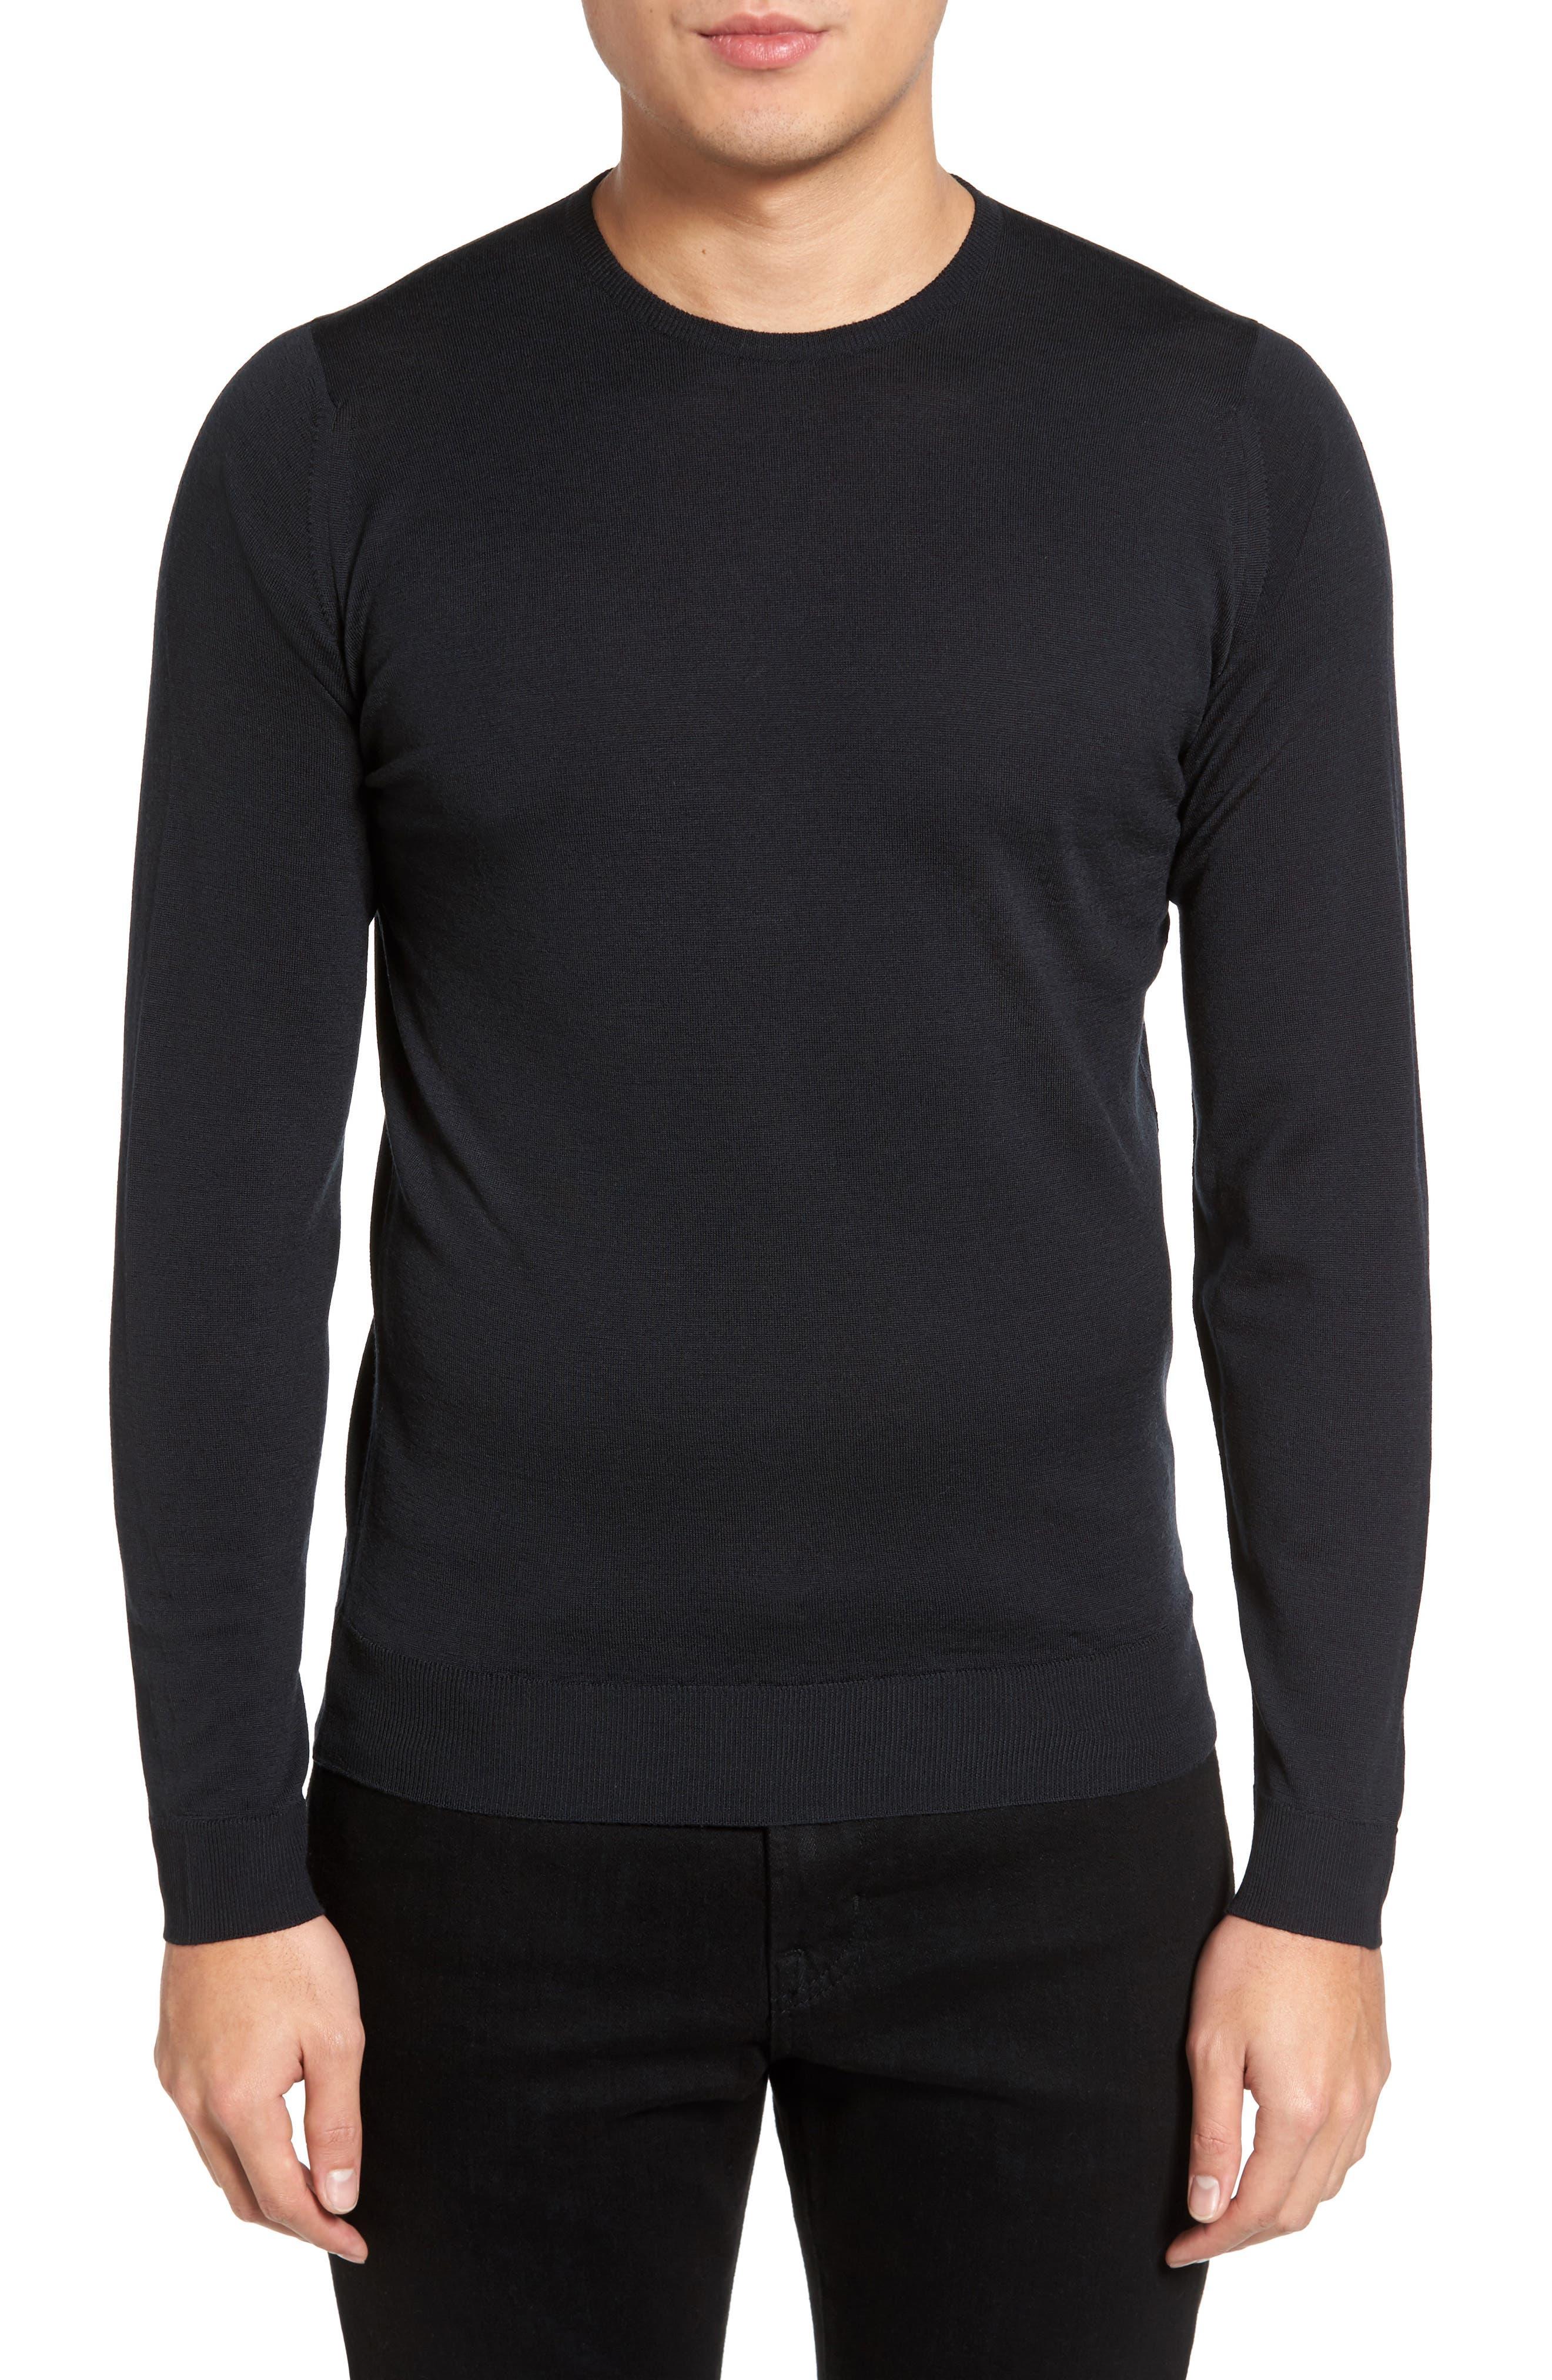 Merino Wool Sweater,                             Main thumbnail 1, color,                             001